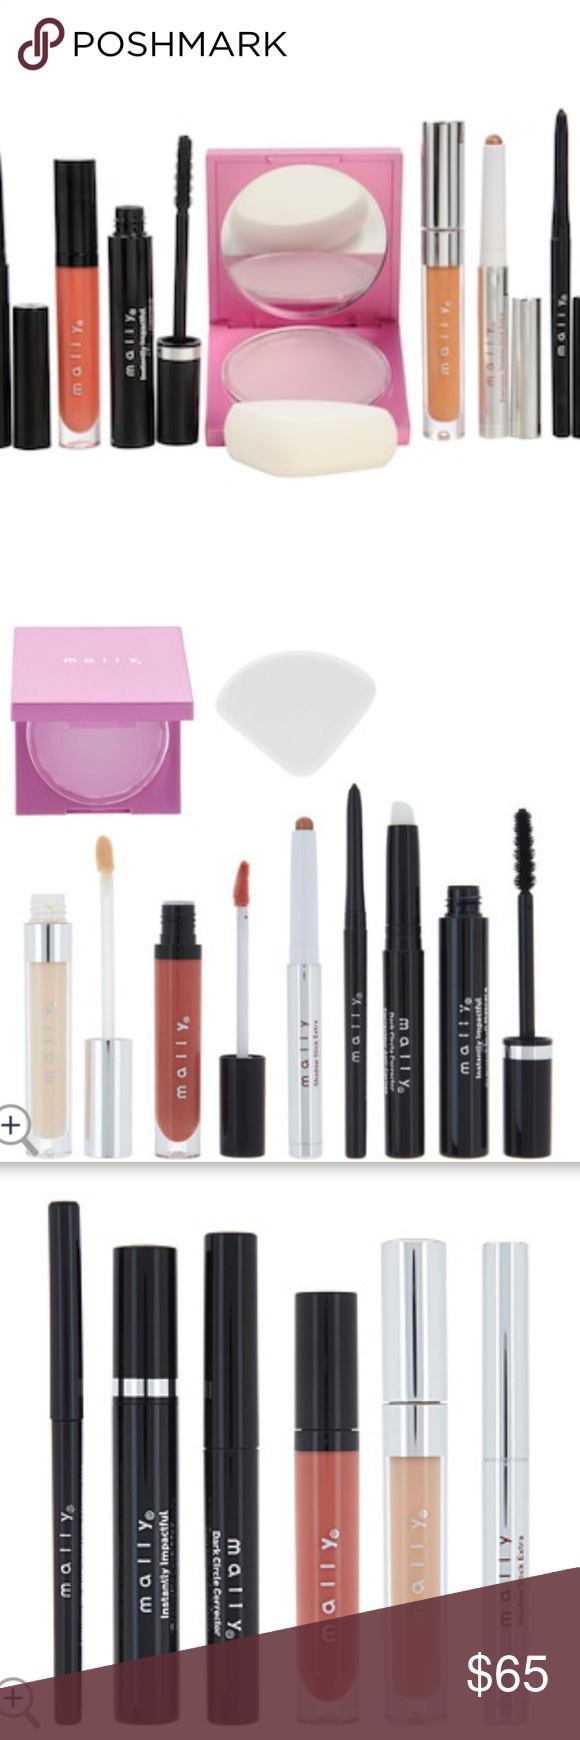 Mally Cosmetics Love at First Sight Boxed Set NWT Mally